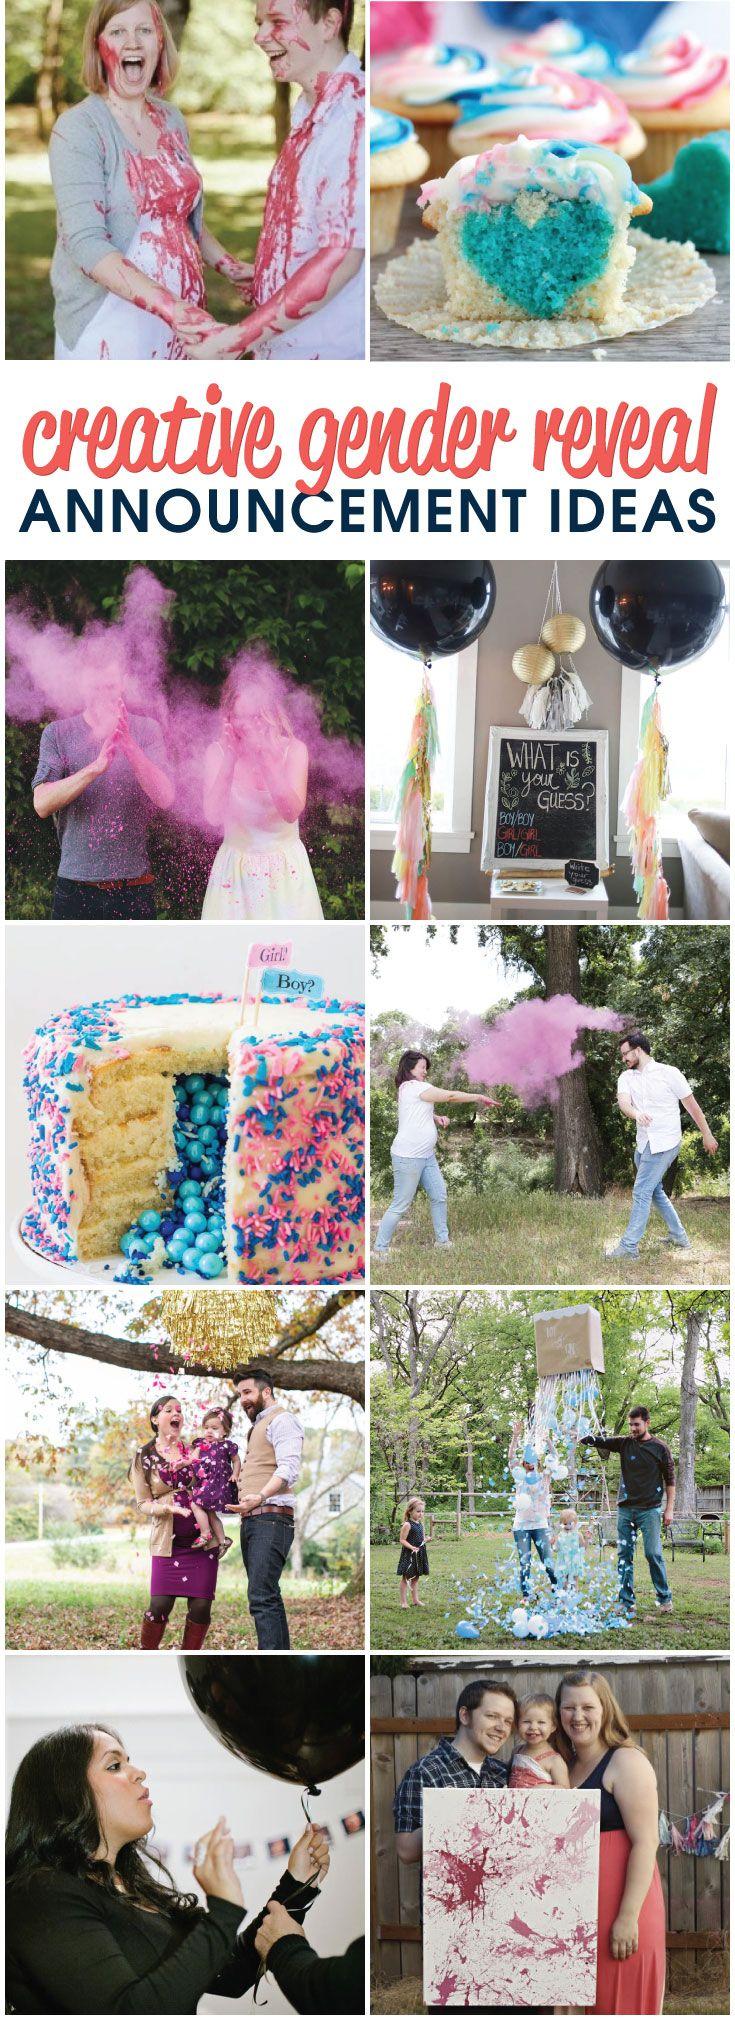 11 Creative Gender Reveal Announcement Ideas | Baby #2 ...